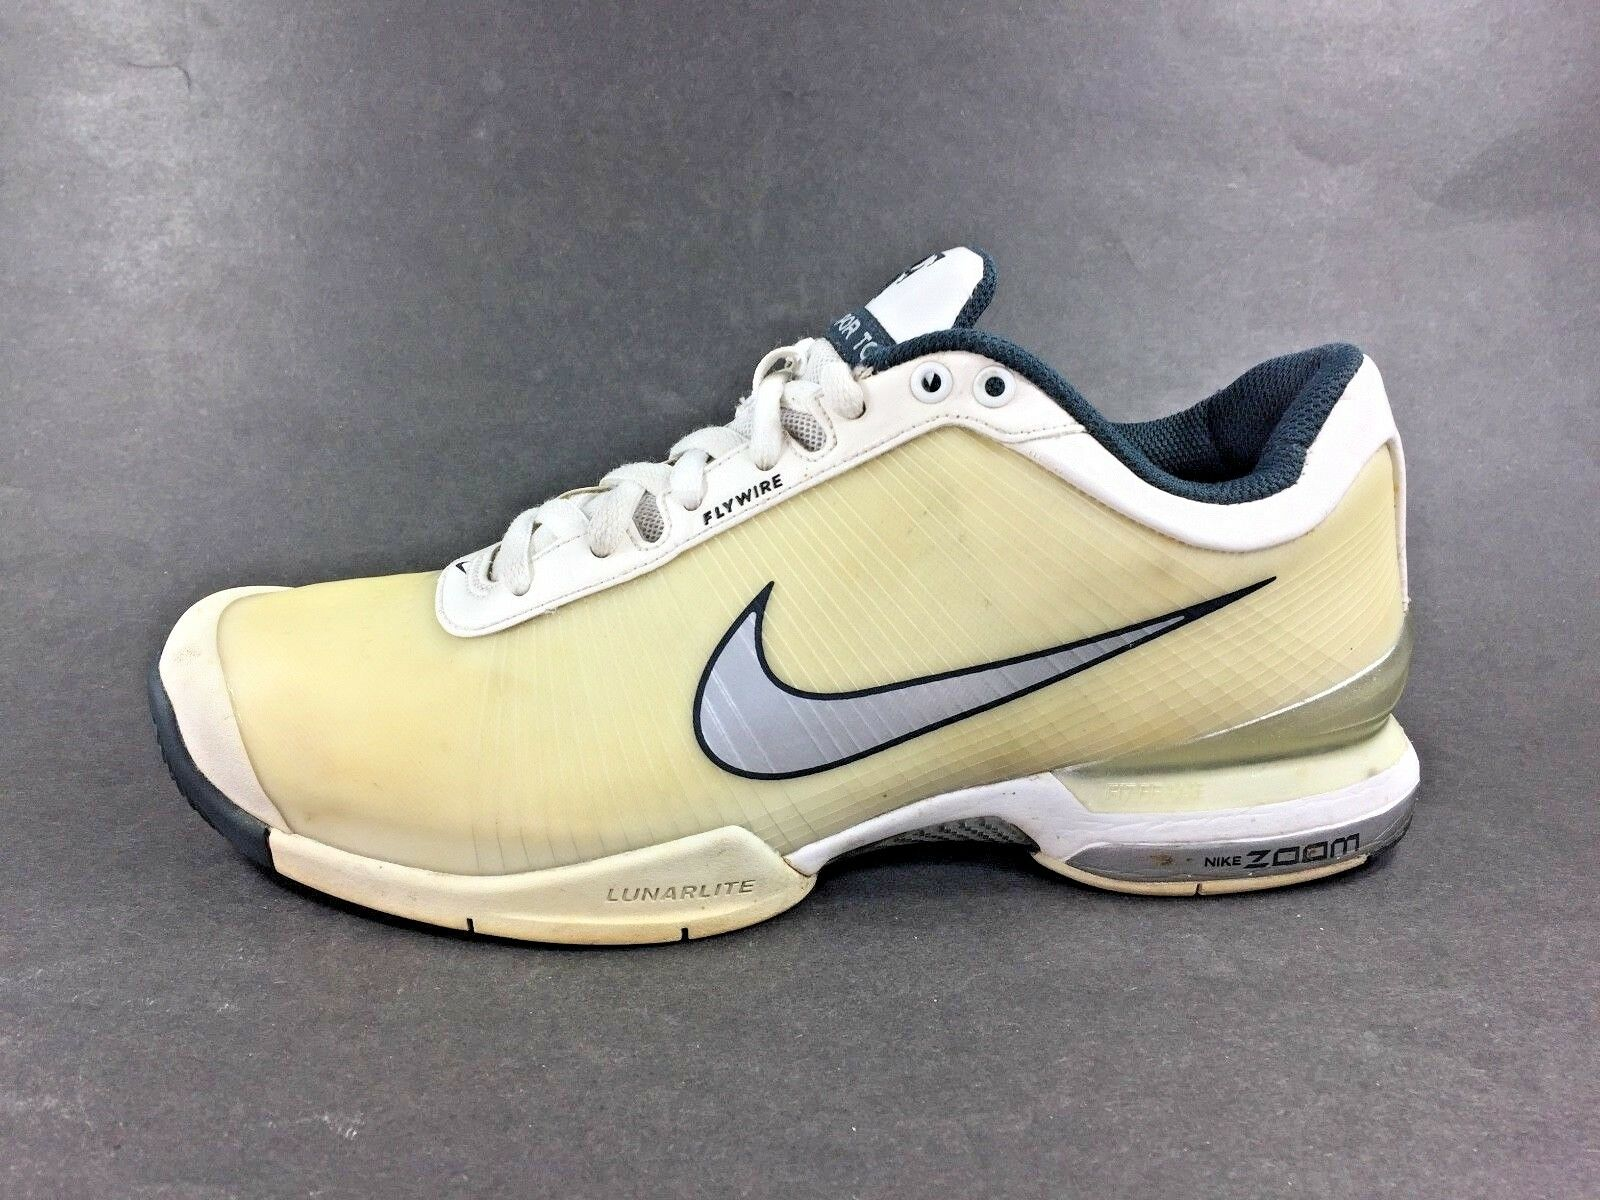 Nike? Zoom Vapor Tour VI  6 Tennis Shoes RF Roger Federer Men Sz 6.5 344539-101